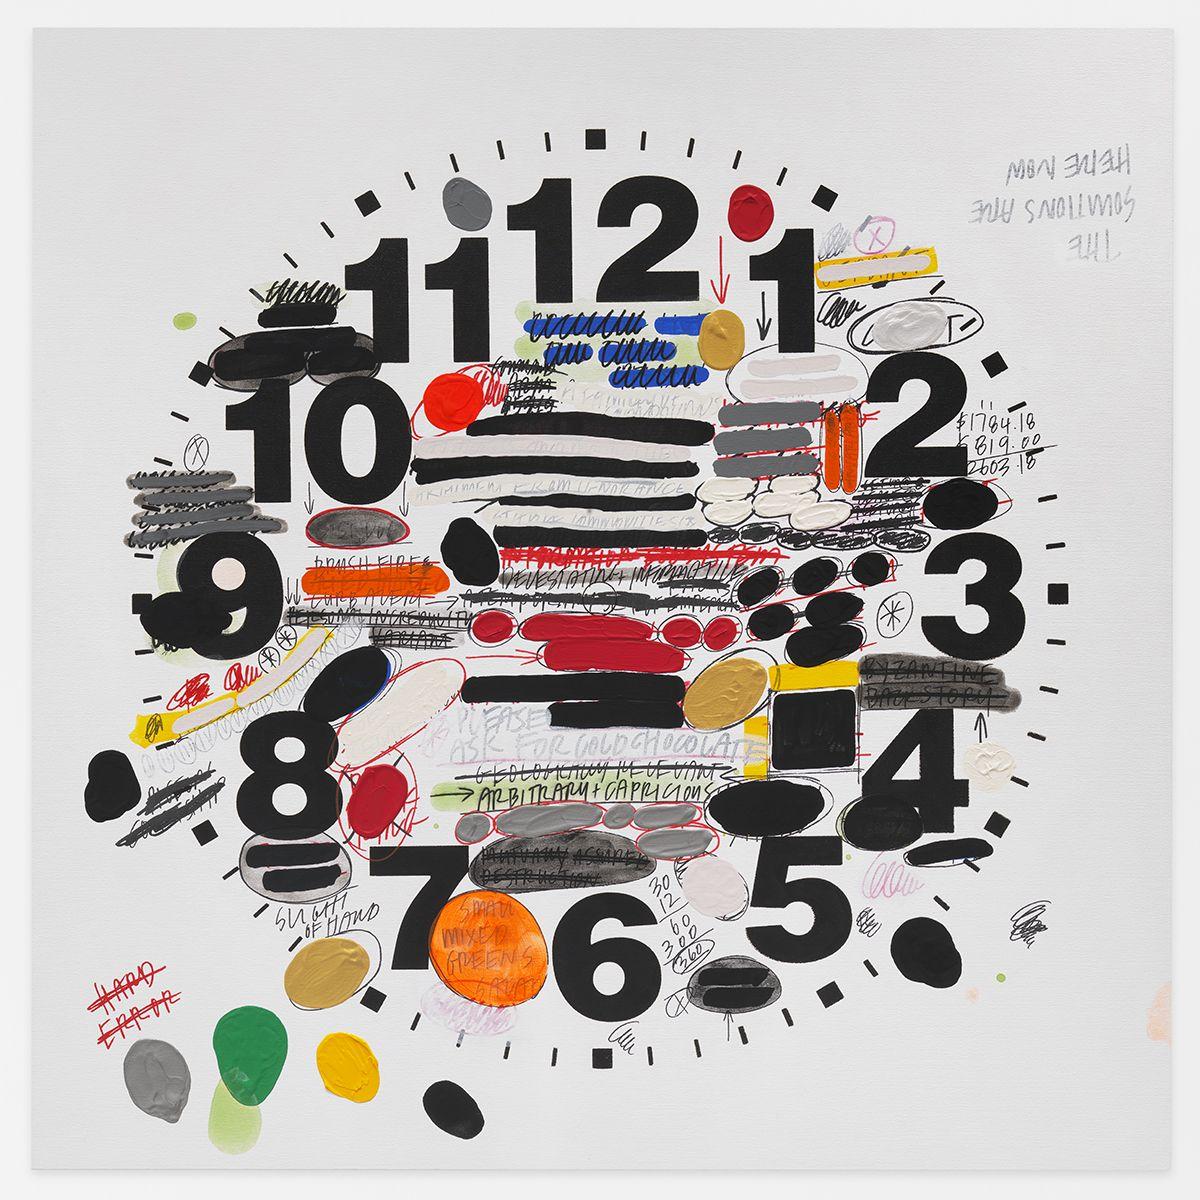 AMANDA ROSS-HO Untitled Timepiece (HARD ERROR)